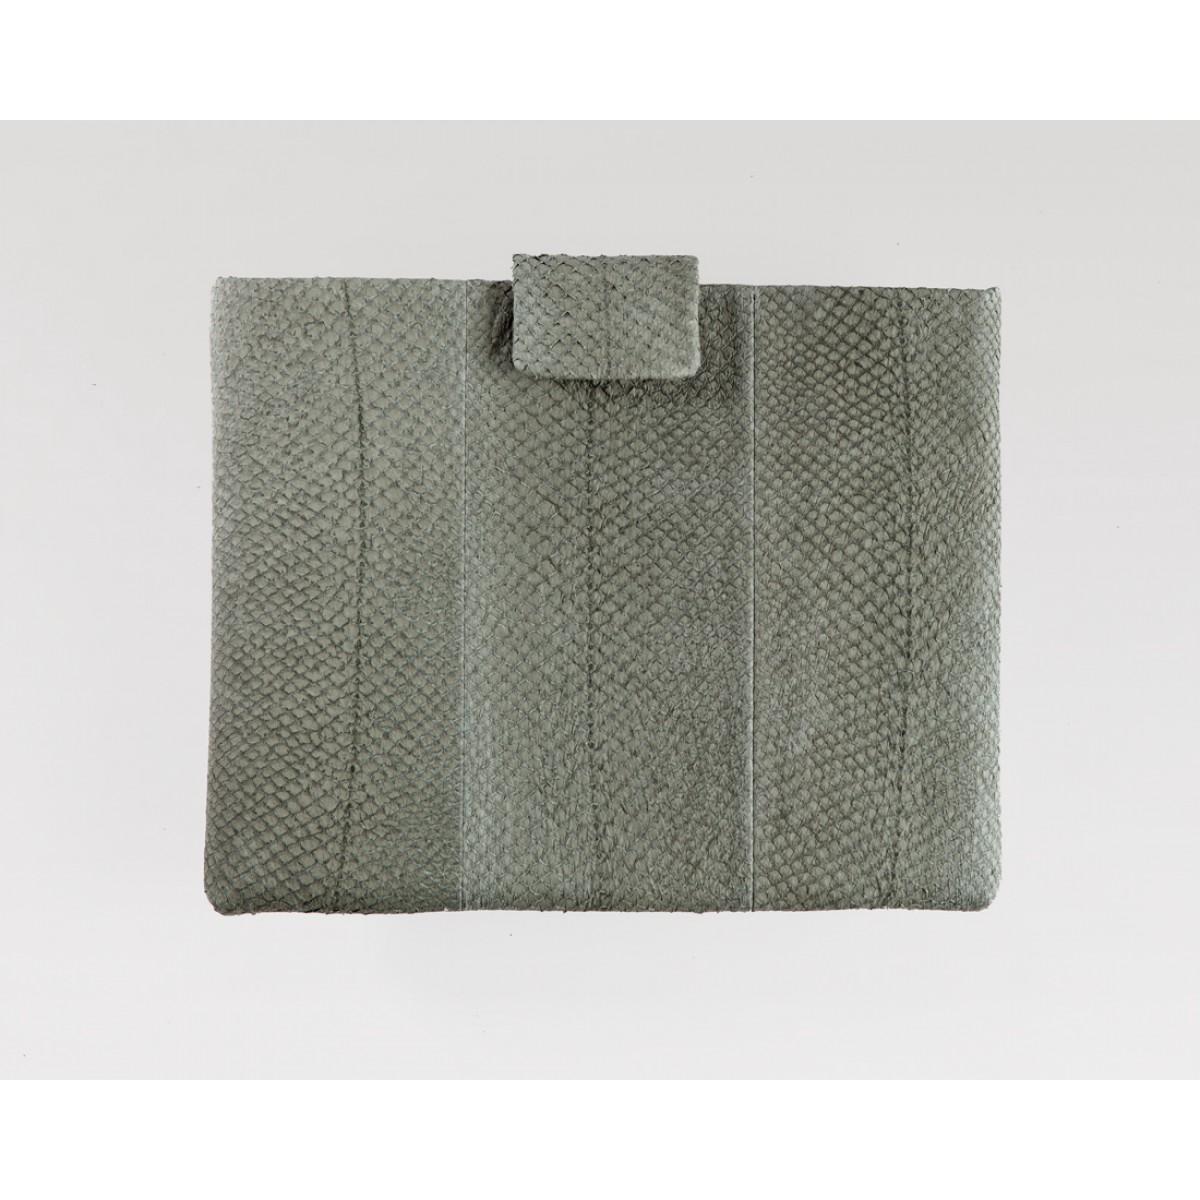 Lapàporter iPad case Lachsleder (reed)